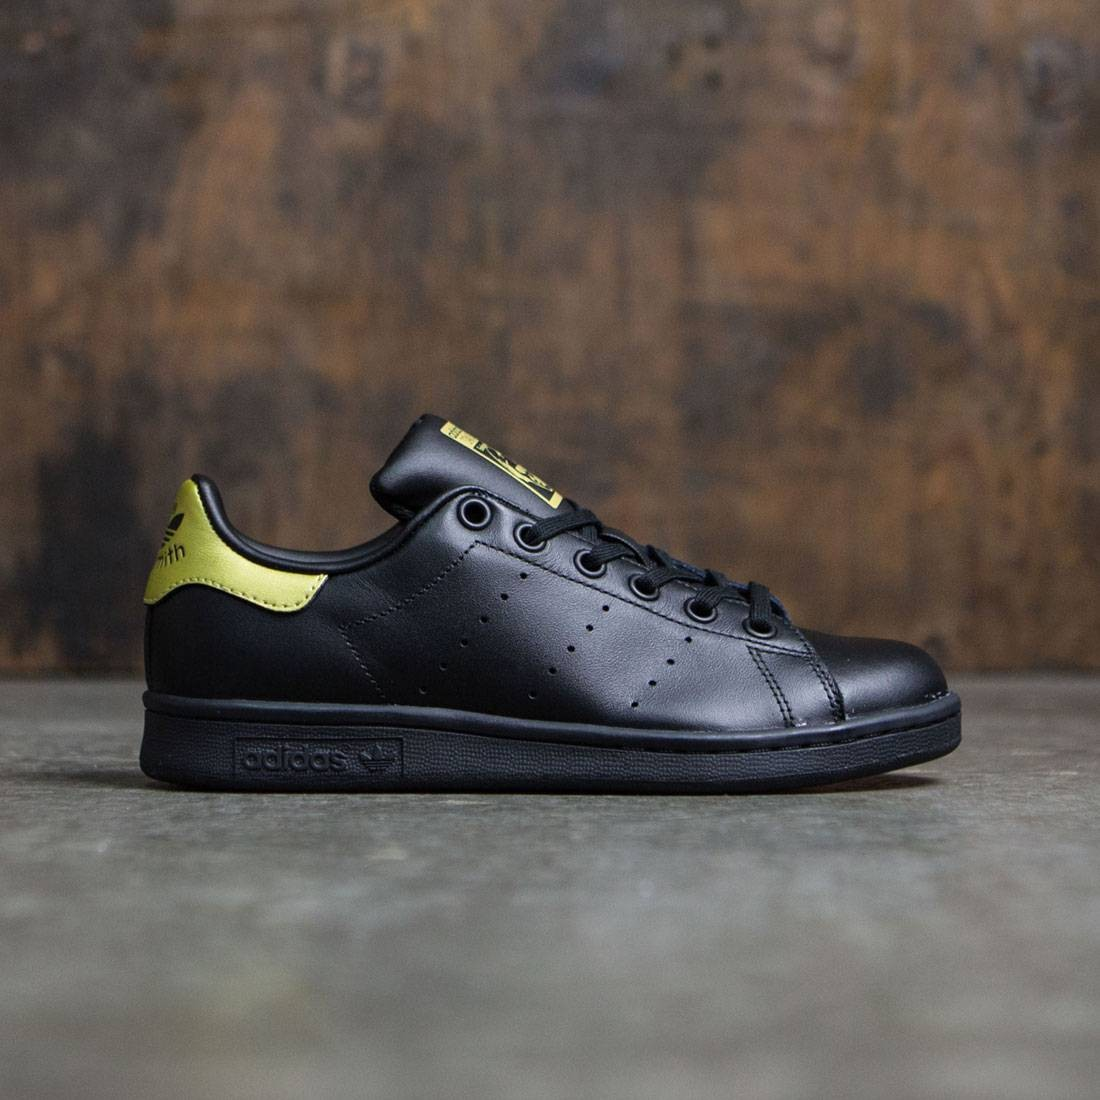 super popular e69d1 31f6c Adidas Big Kids Stan Smith (black / core black / gold metallic)